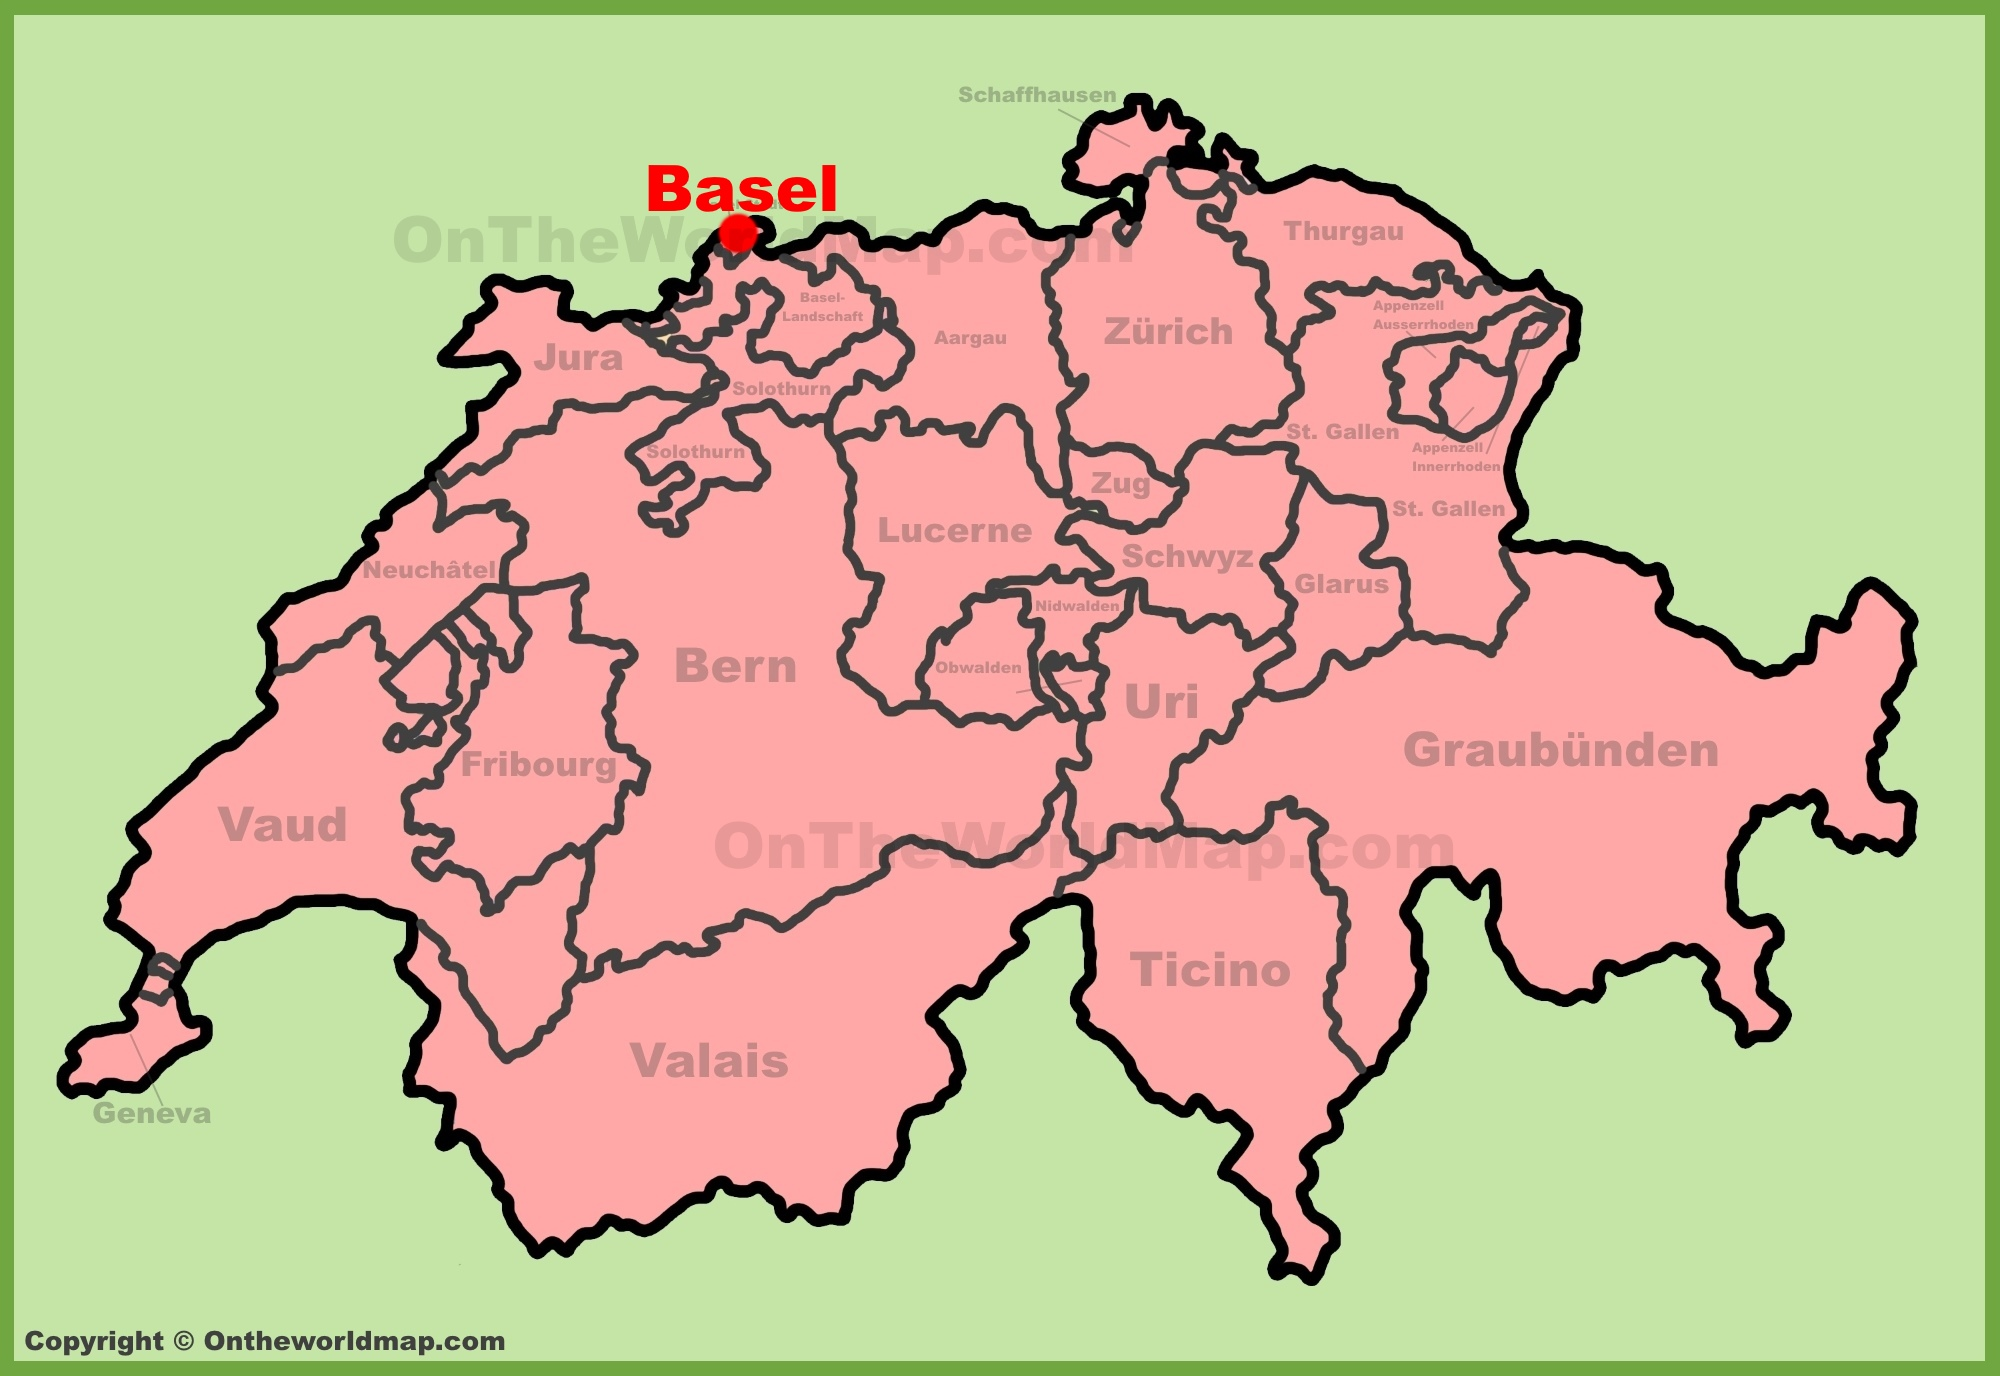 Basel location on the Switzerland map